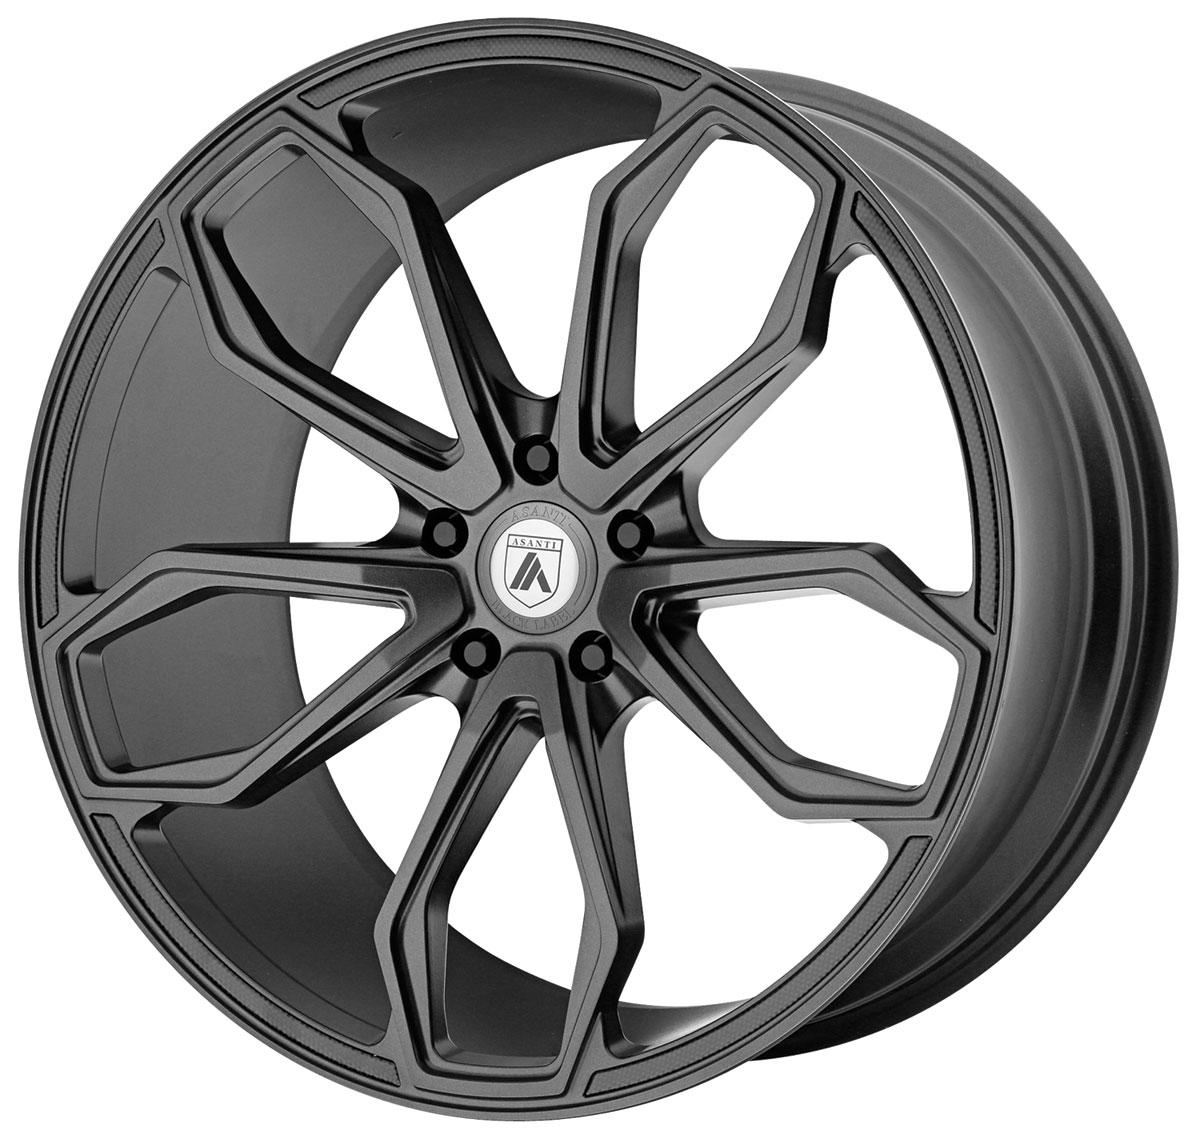 Wheel, Asanti Black, ABL-19 Athena, 2019 CAD, 20x8.5